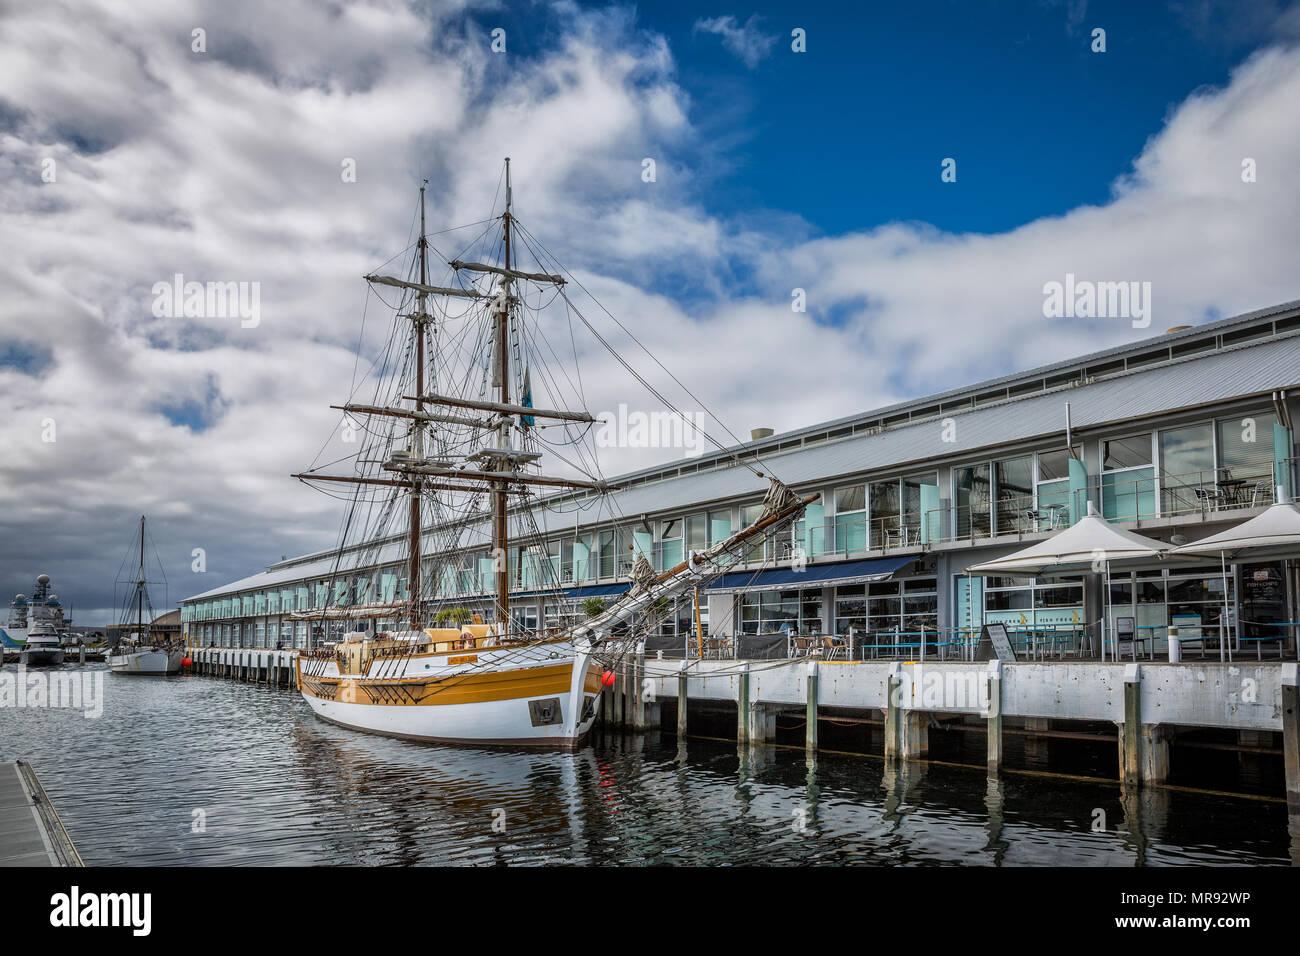 Twin masted sailing ship the Lady Nelson in Hobart, Tasmania, Australia Stock Photo